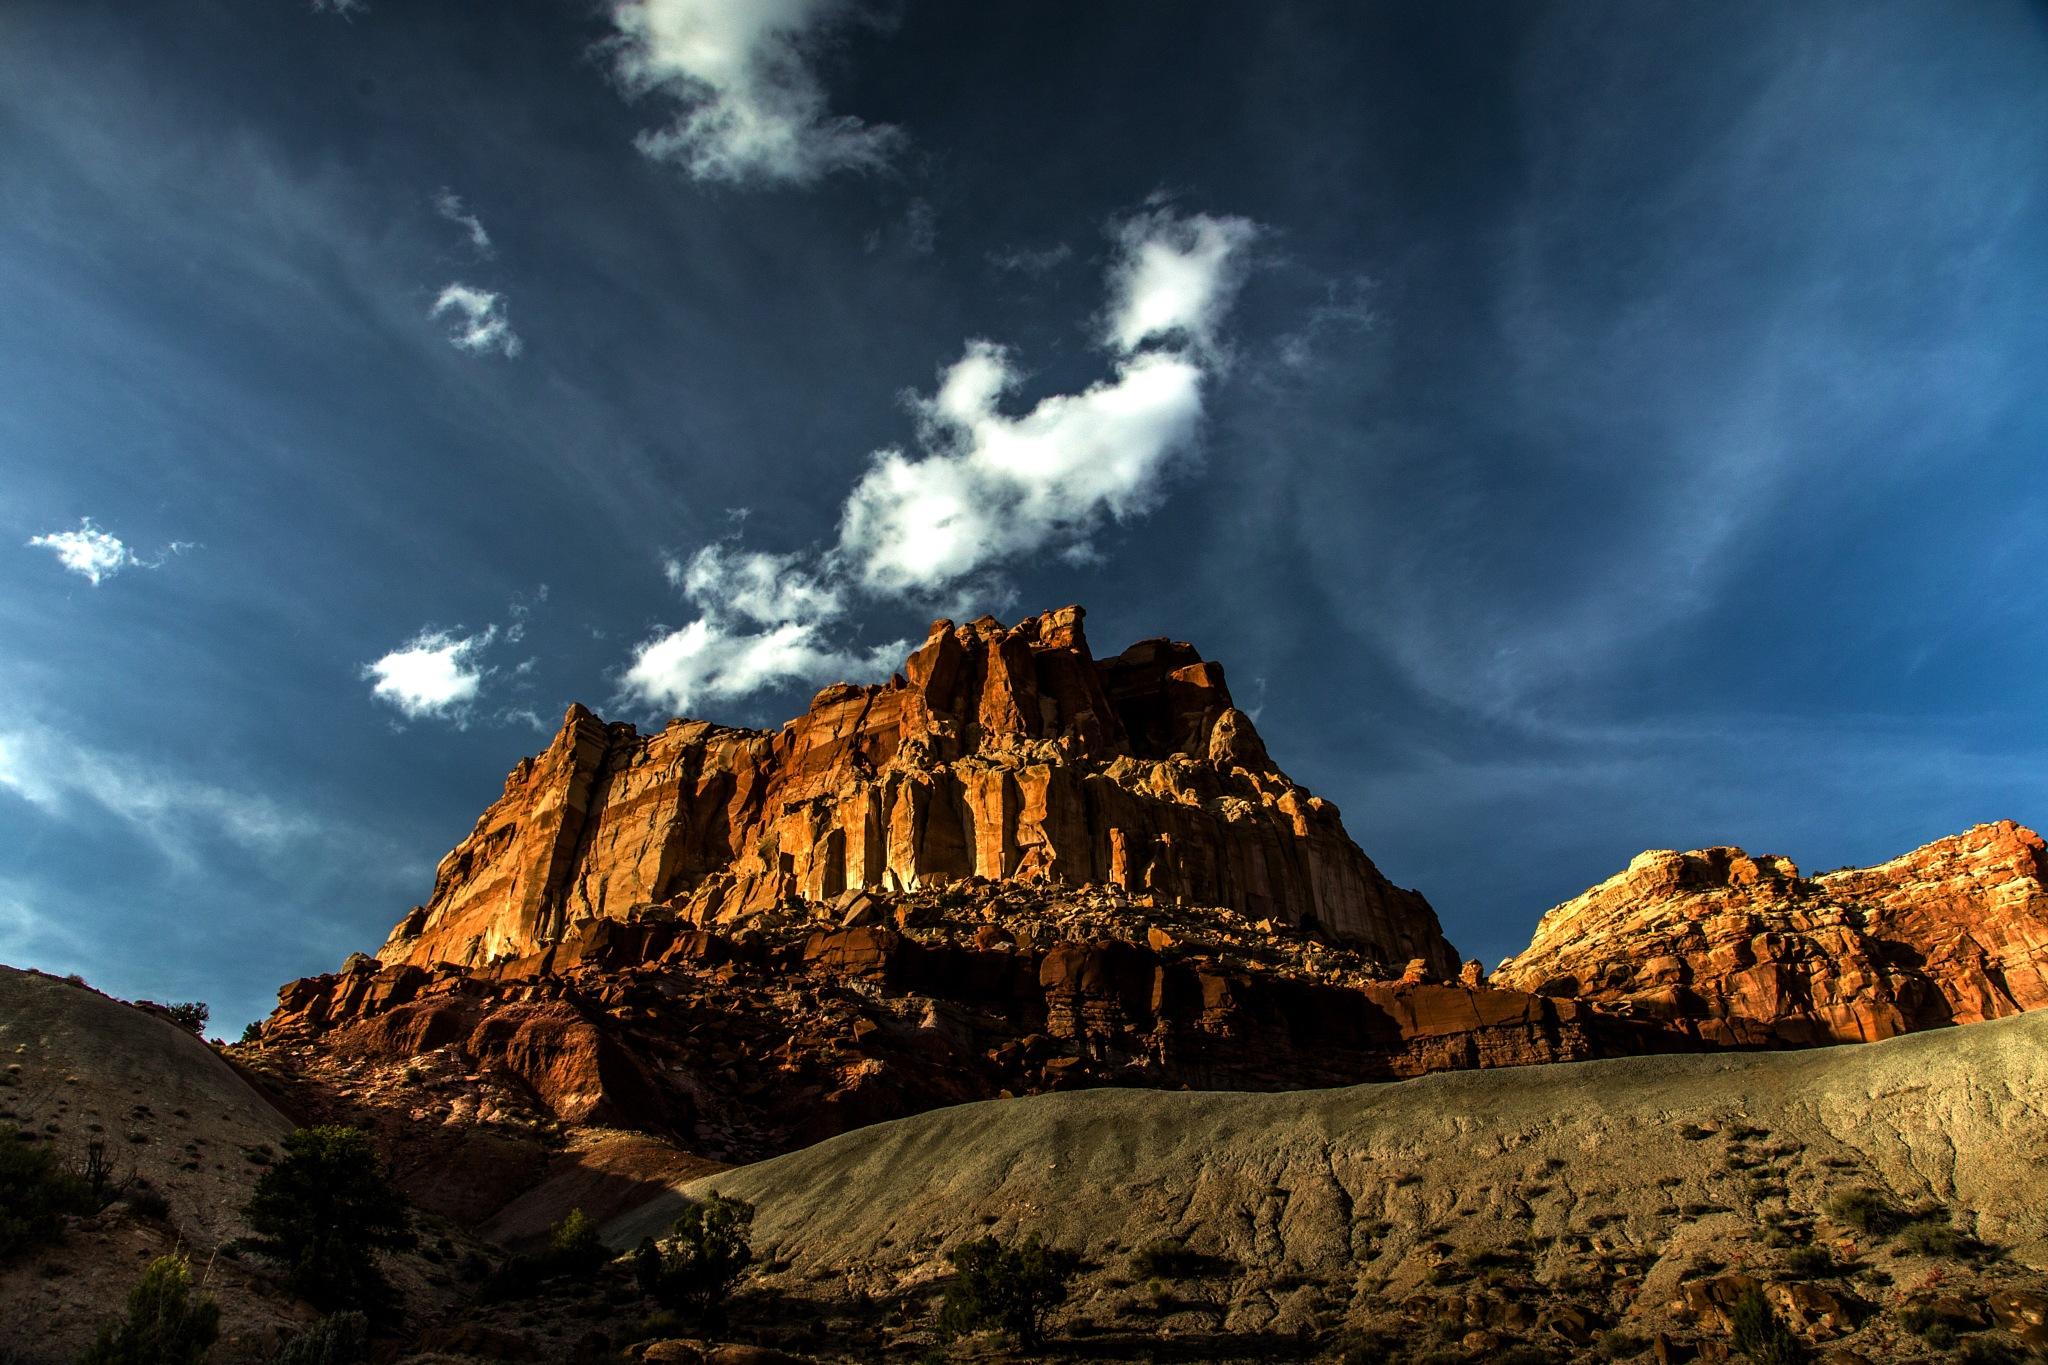 glowing rock by volkhard sturzbecher